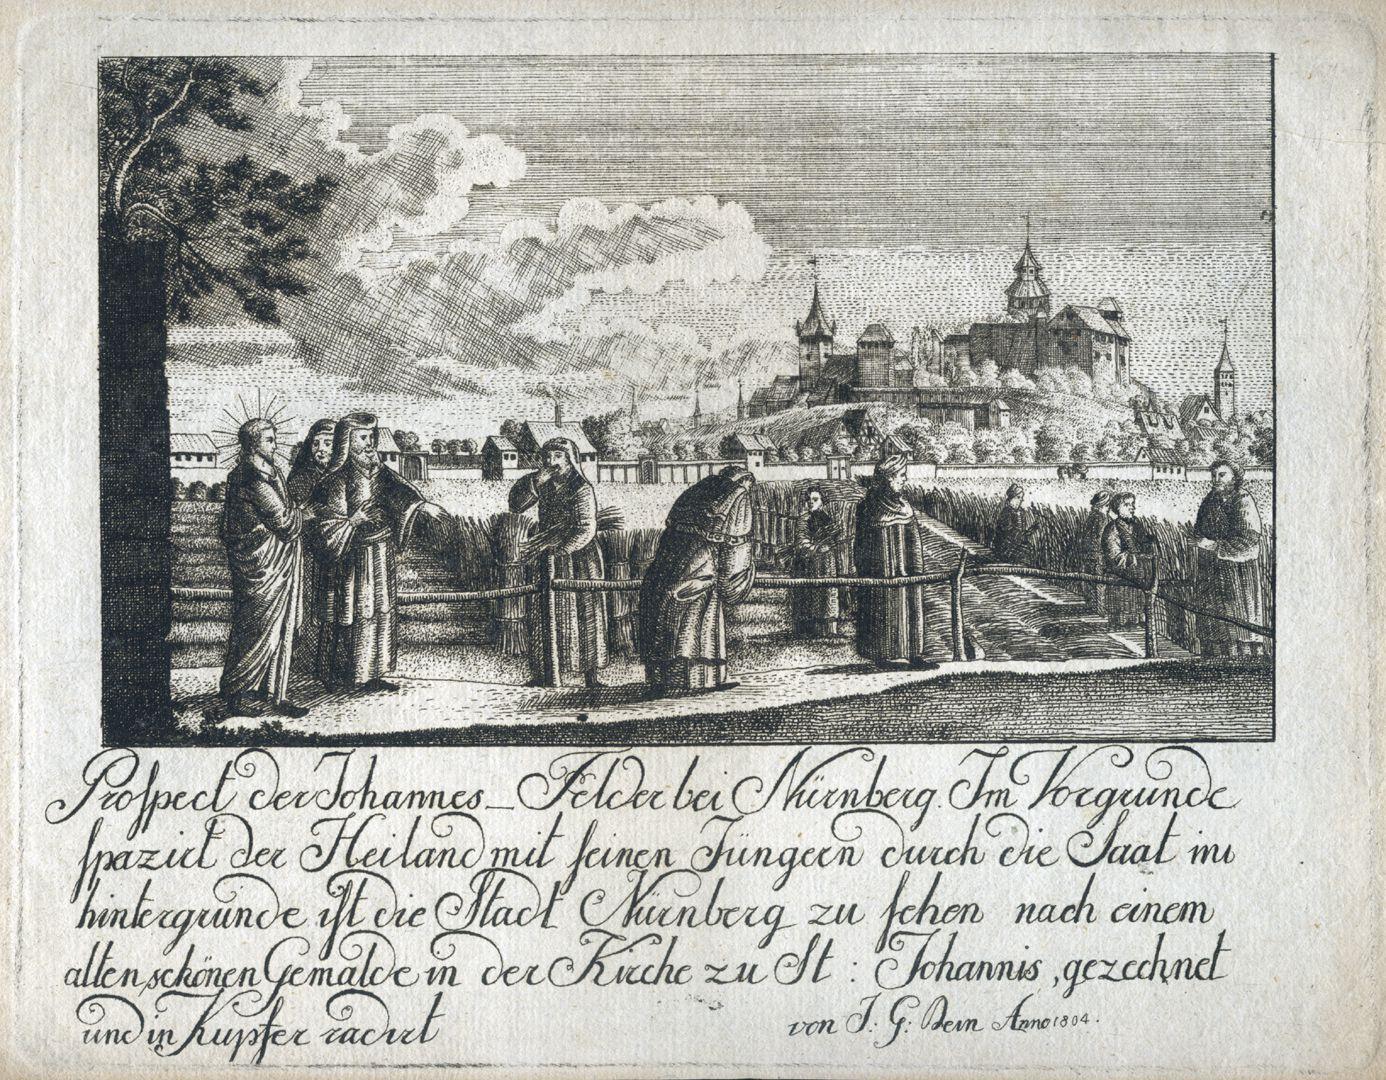 Prospect der Johannes_Felder bei Nürnberg Bild mit Inschrift